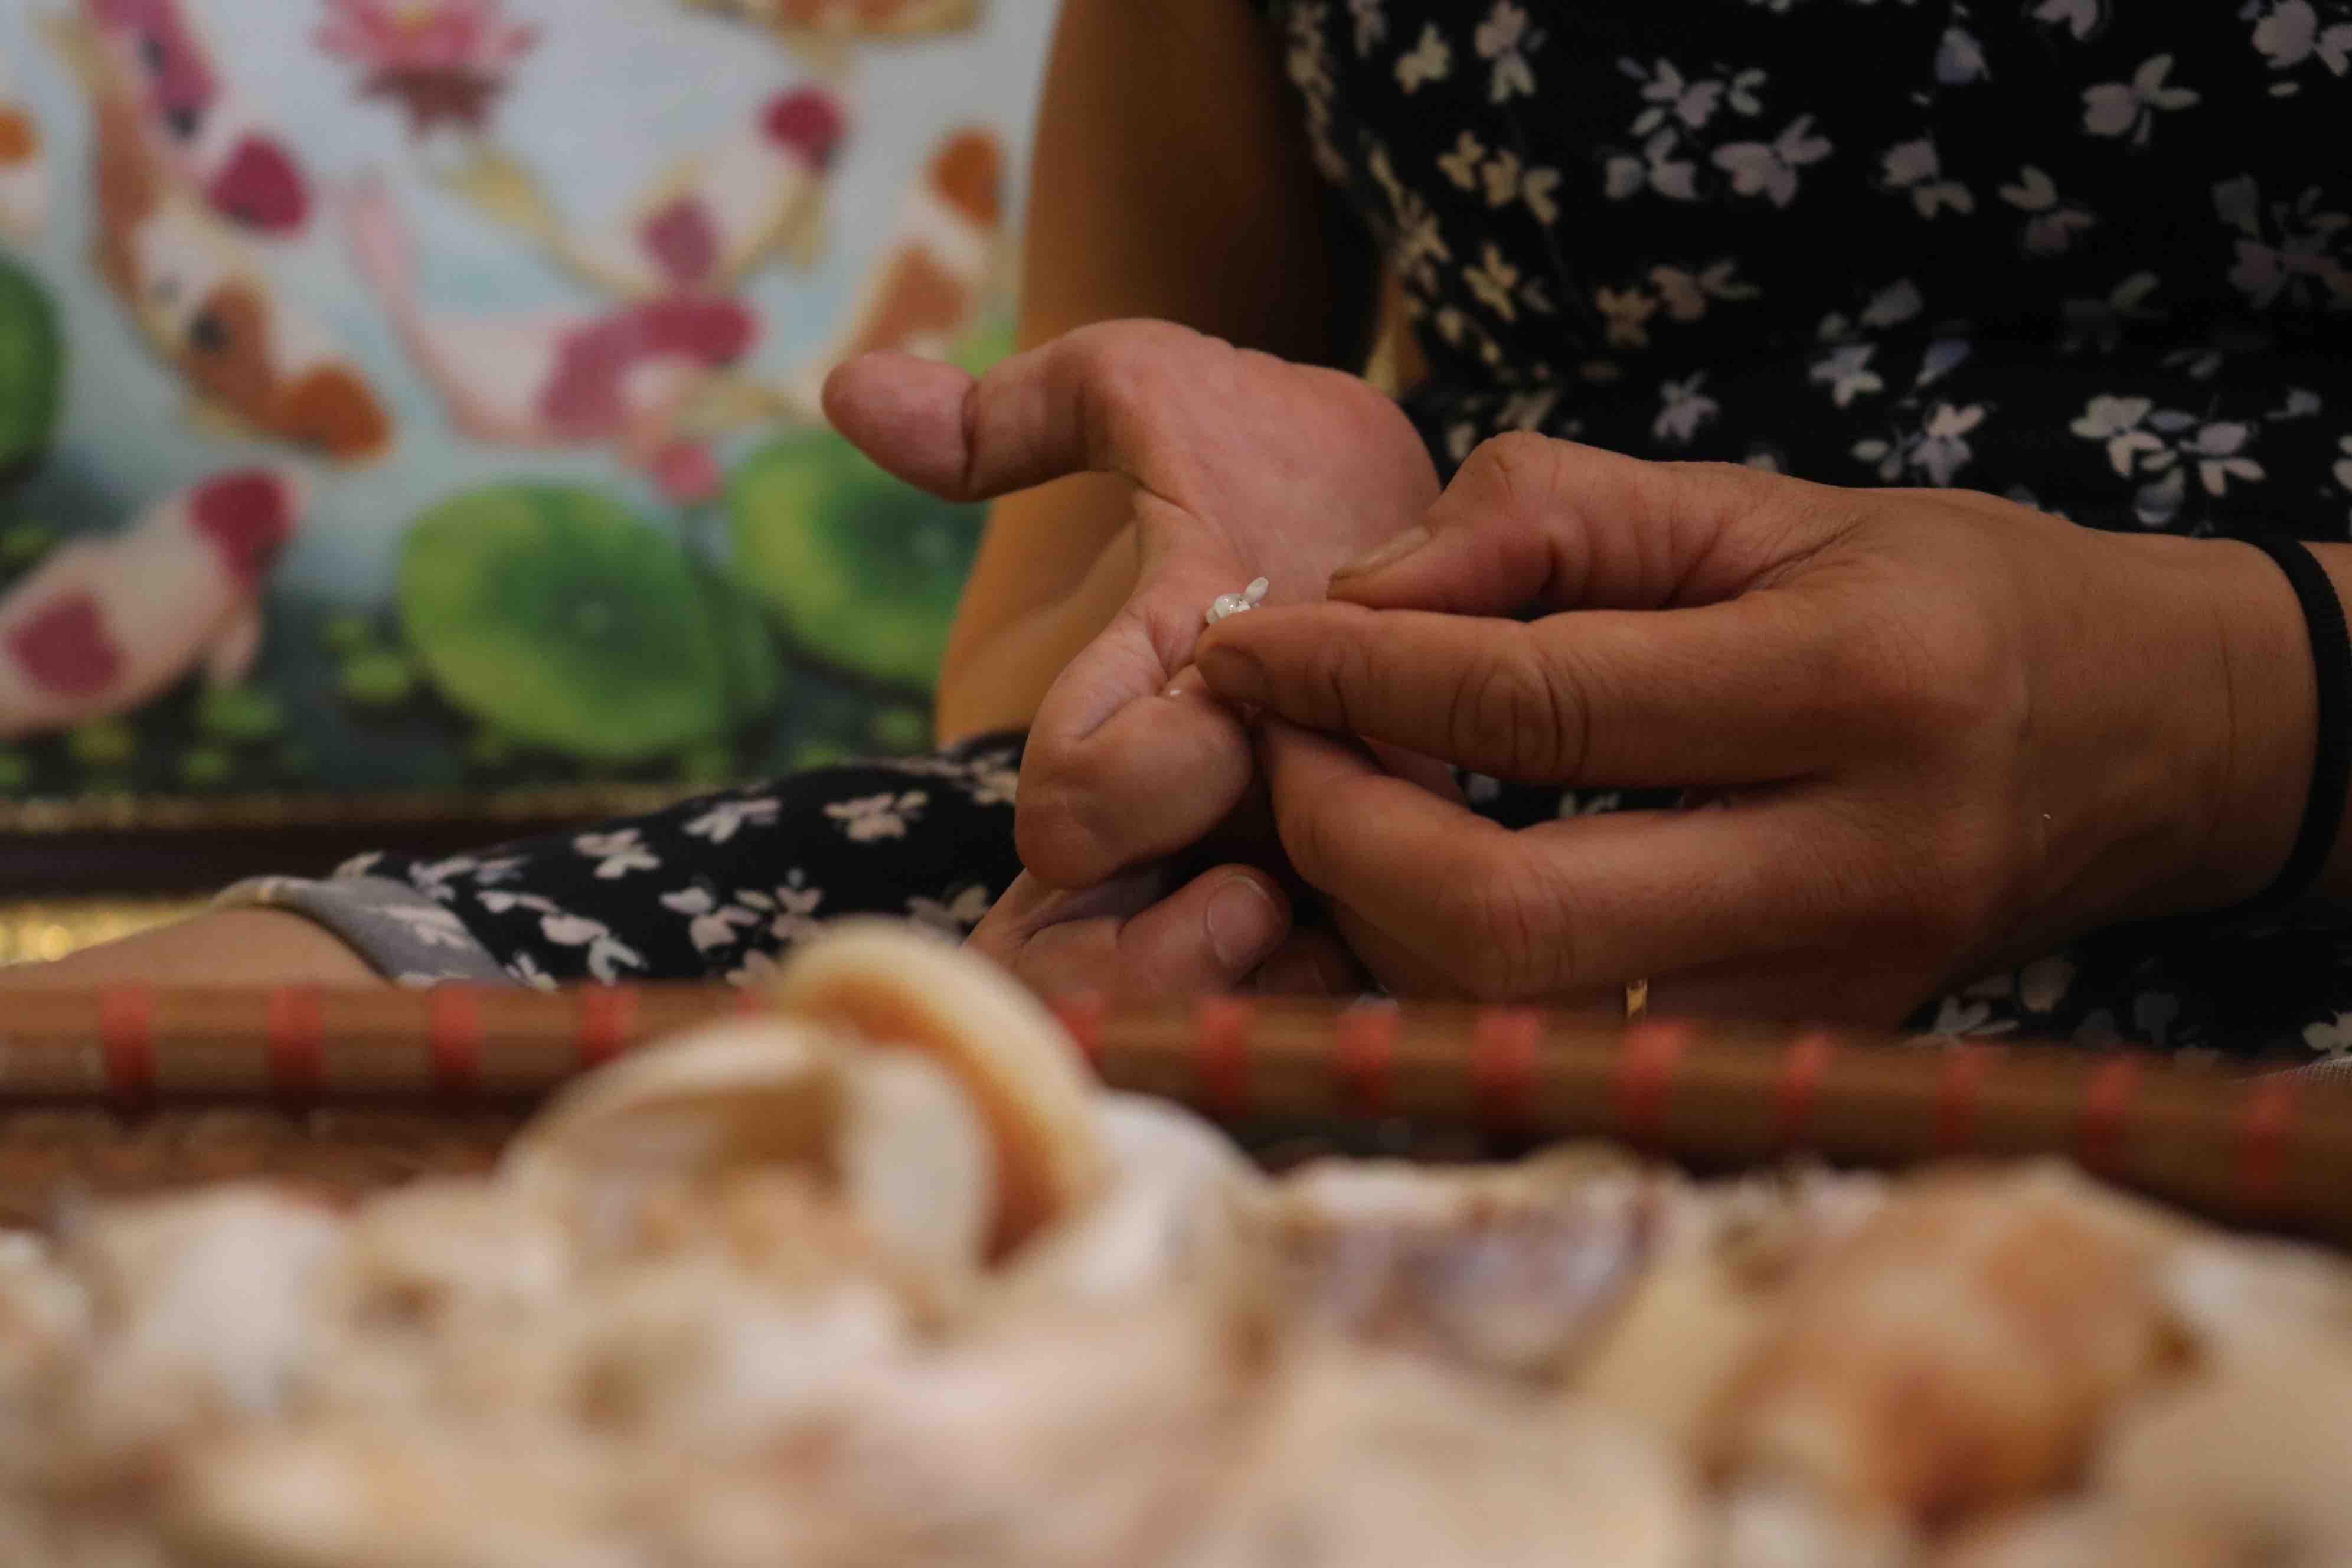 Tran Thi Ngoc Hieu exhibits her skills on a shell product at District 1, Ho Chi Minh City. Photo: Hoang An / Tuoi Tre